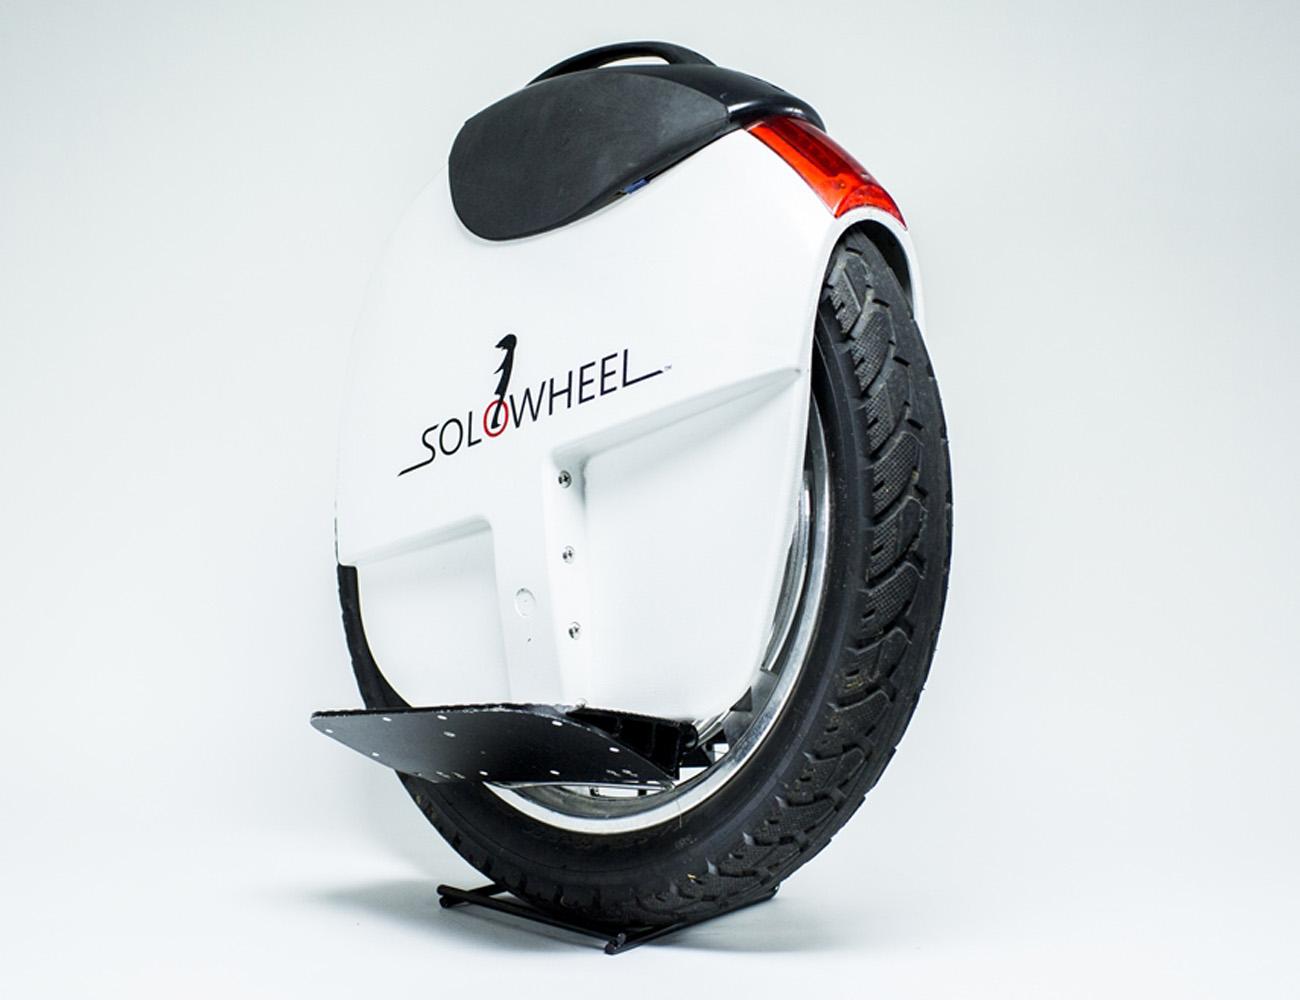 Solowheel Xtreme Electric Unicycle